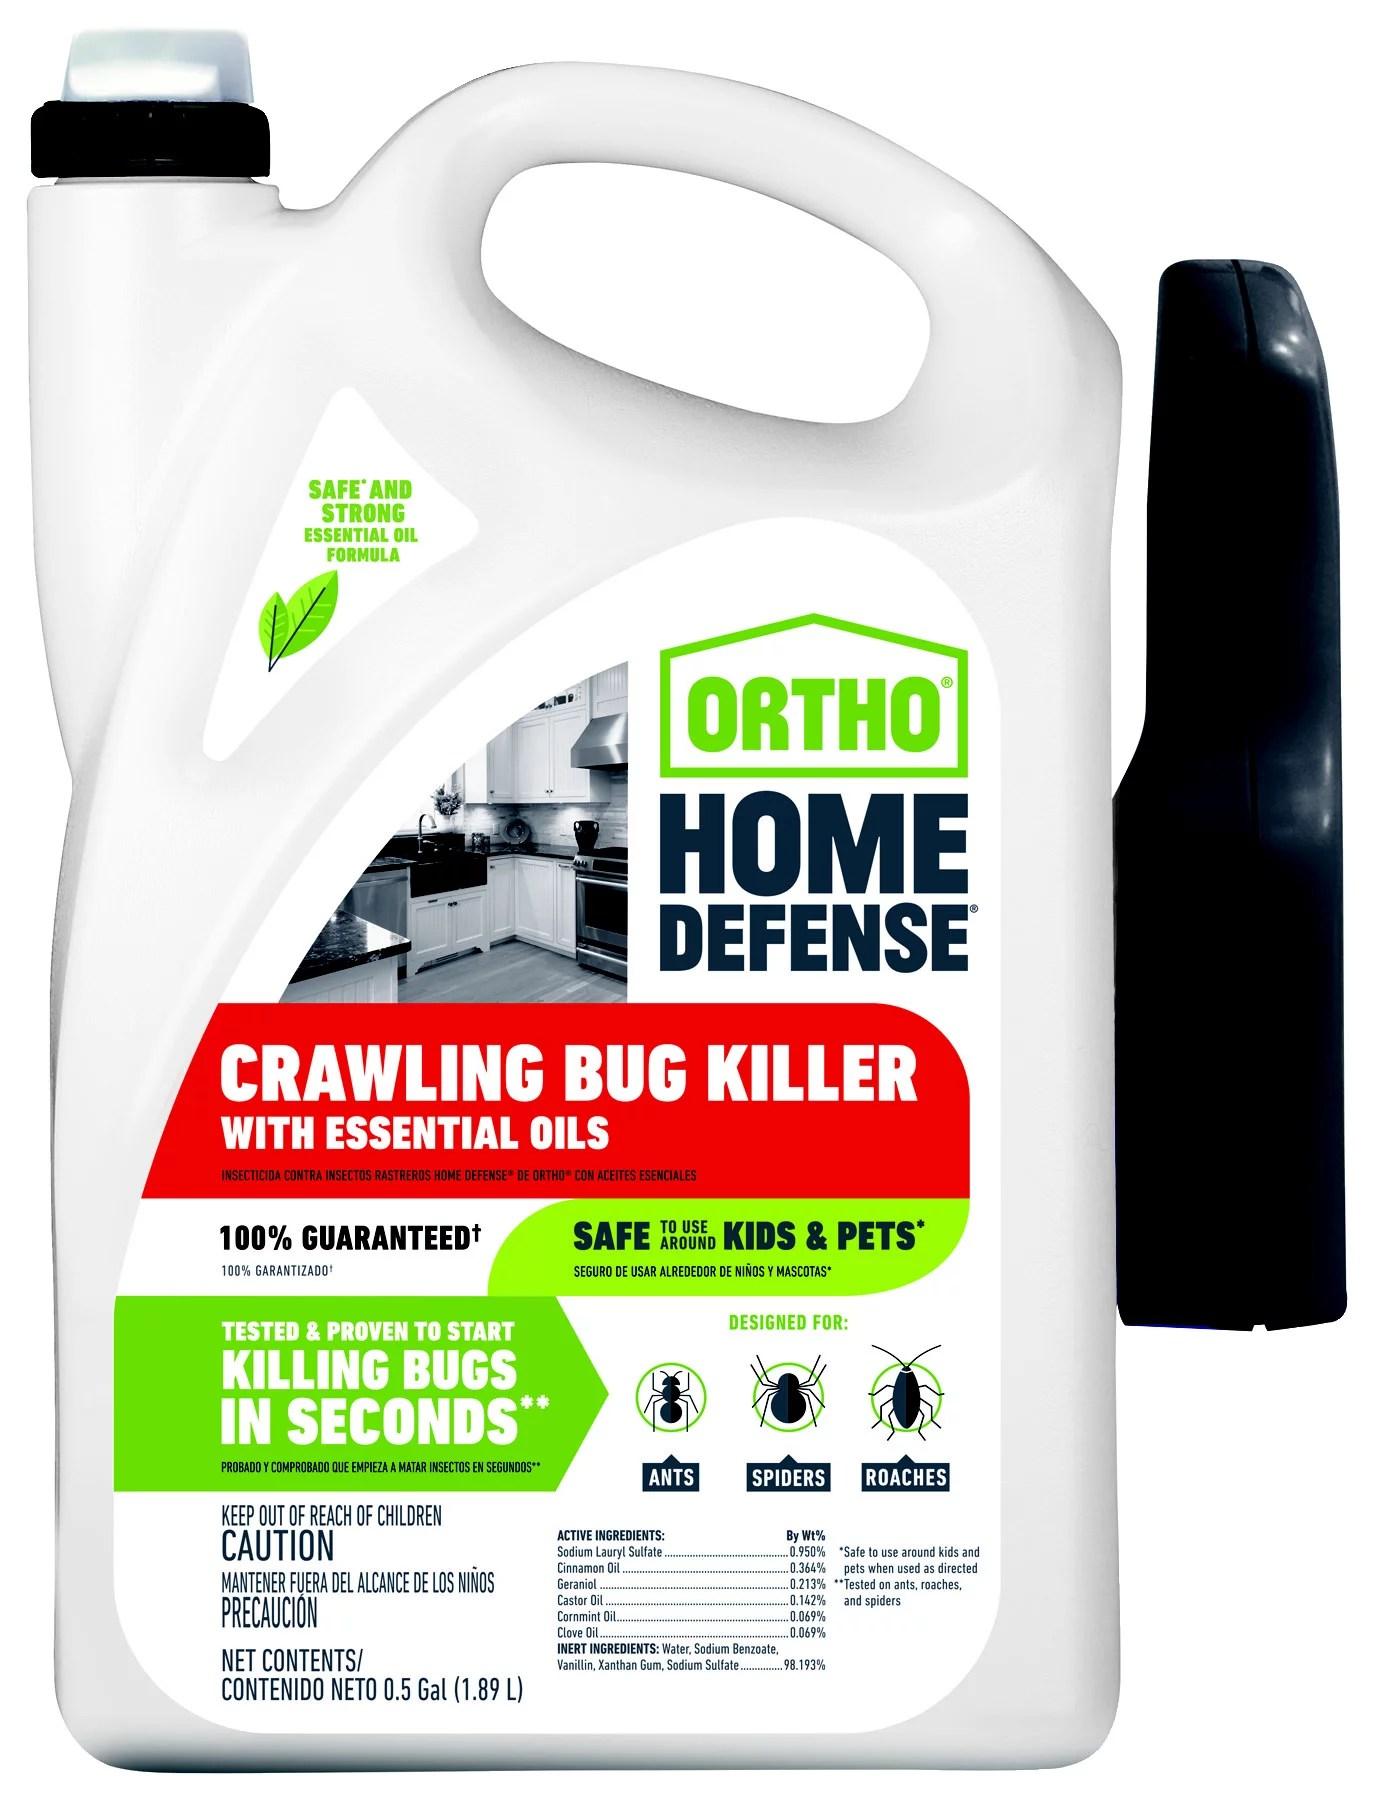 Ortho Home Defense Label : ortho, defense, label, Ortho, Defense, Crawling, Killer, Essential, Walmart.com